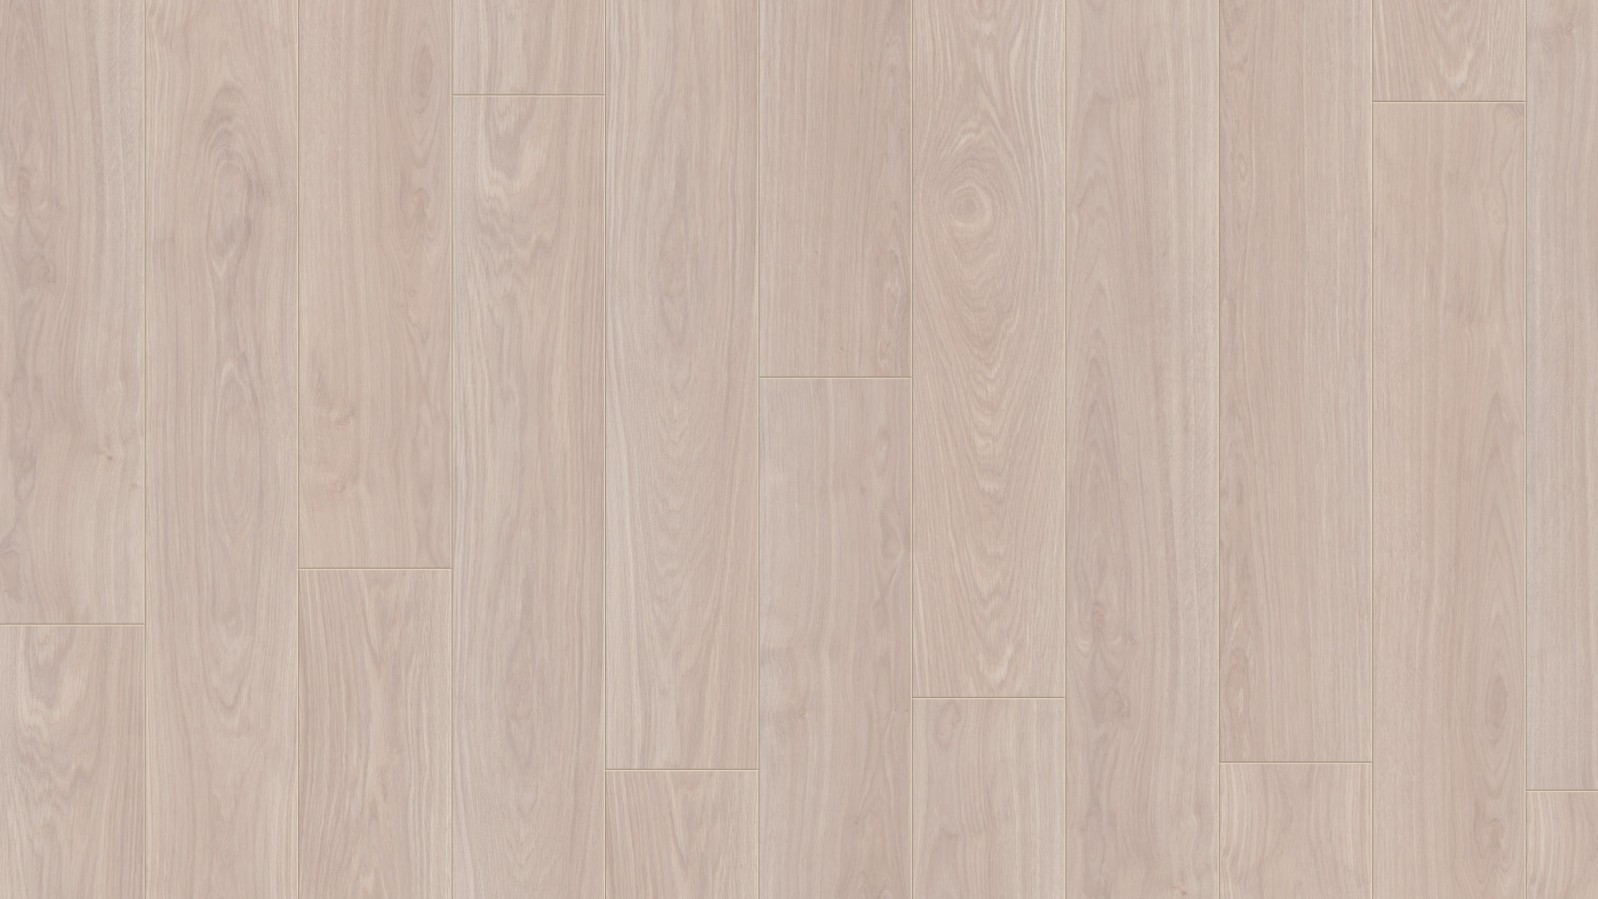 Kronotex Ламинат Exquisit D2873 Дуб Вейвлесс белый